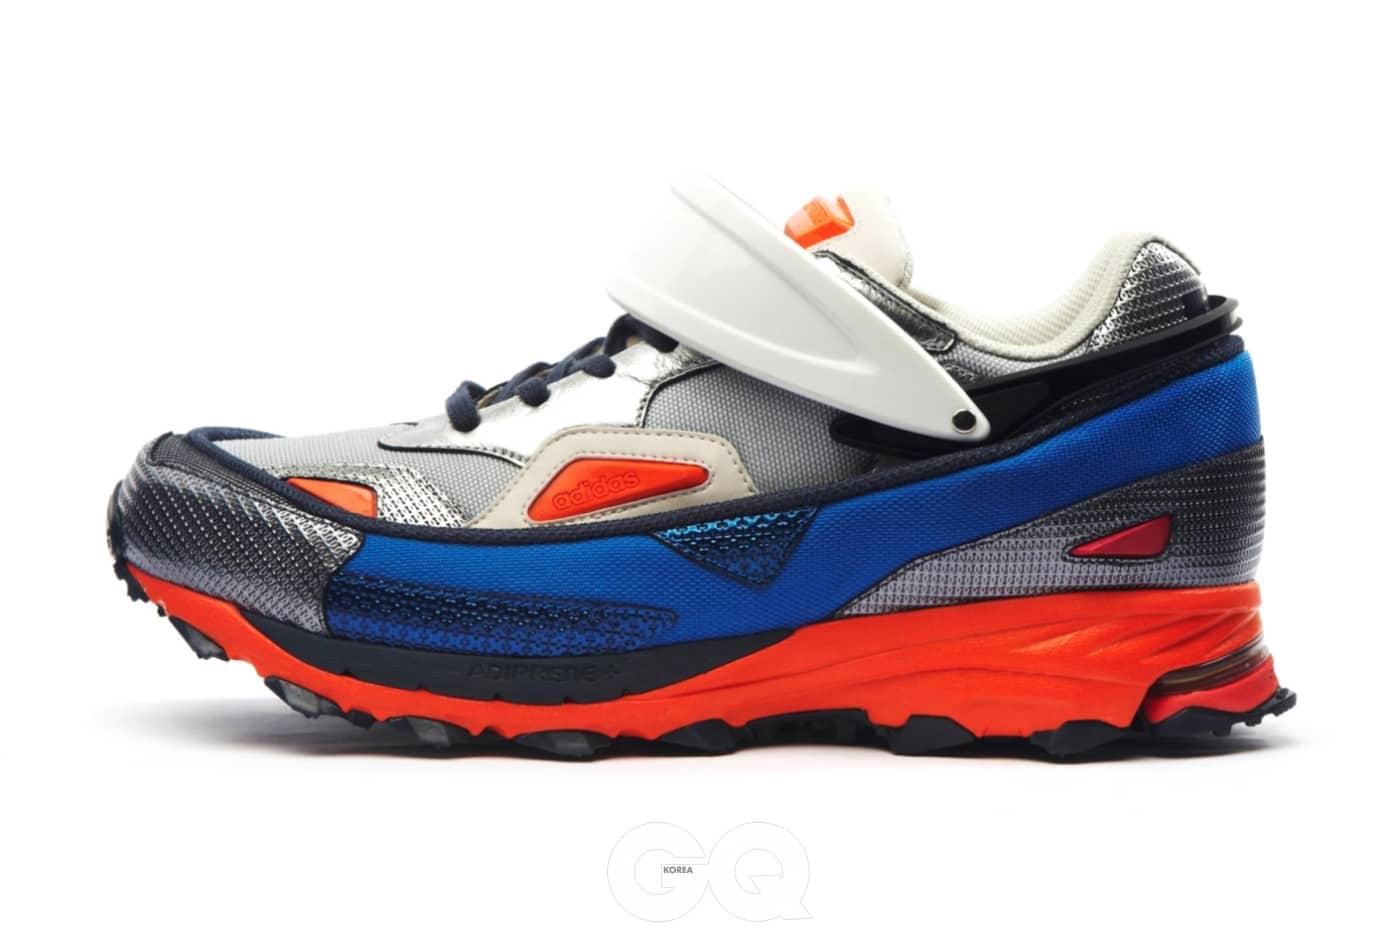 raf-simons-for-adidas-fall-winter-collection-6